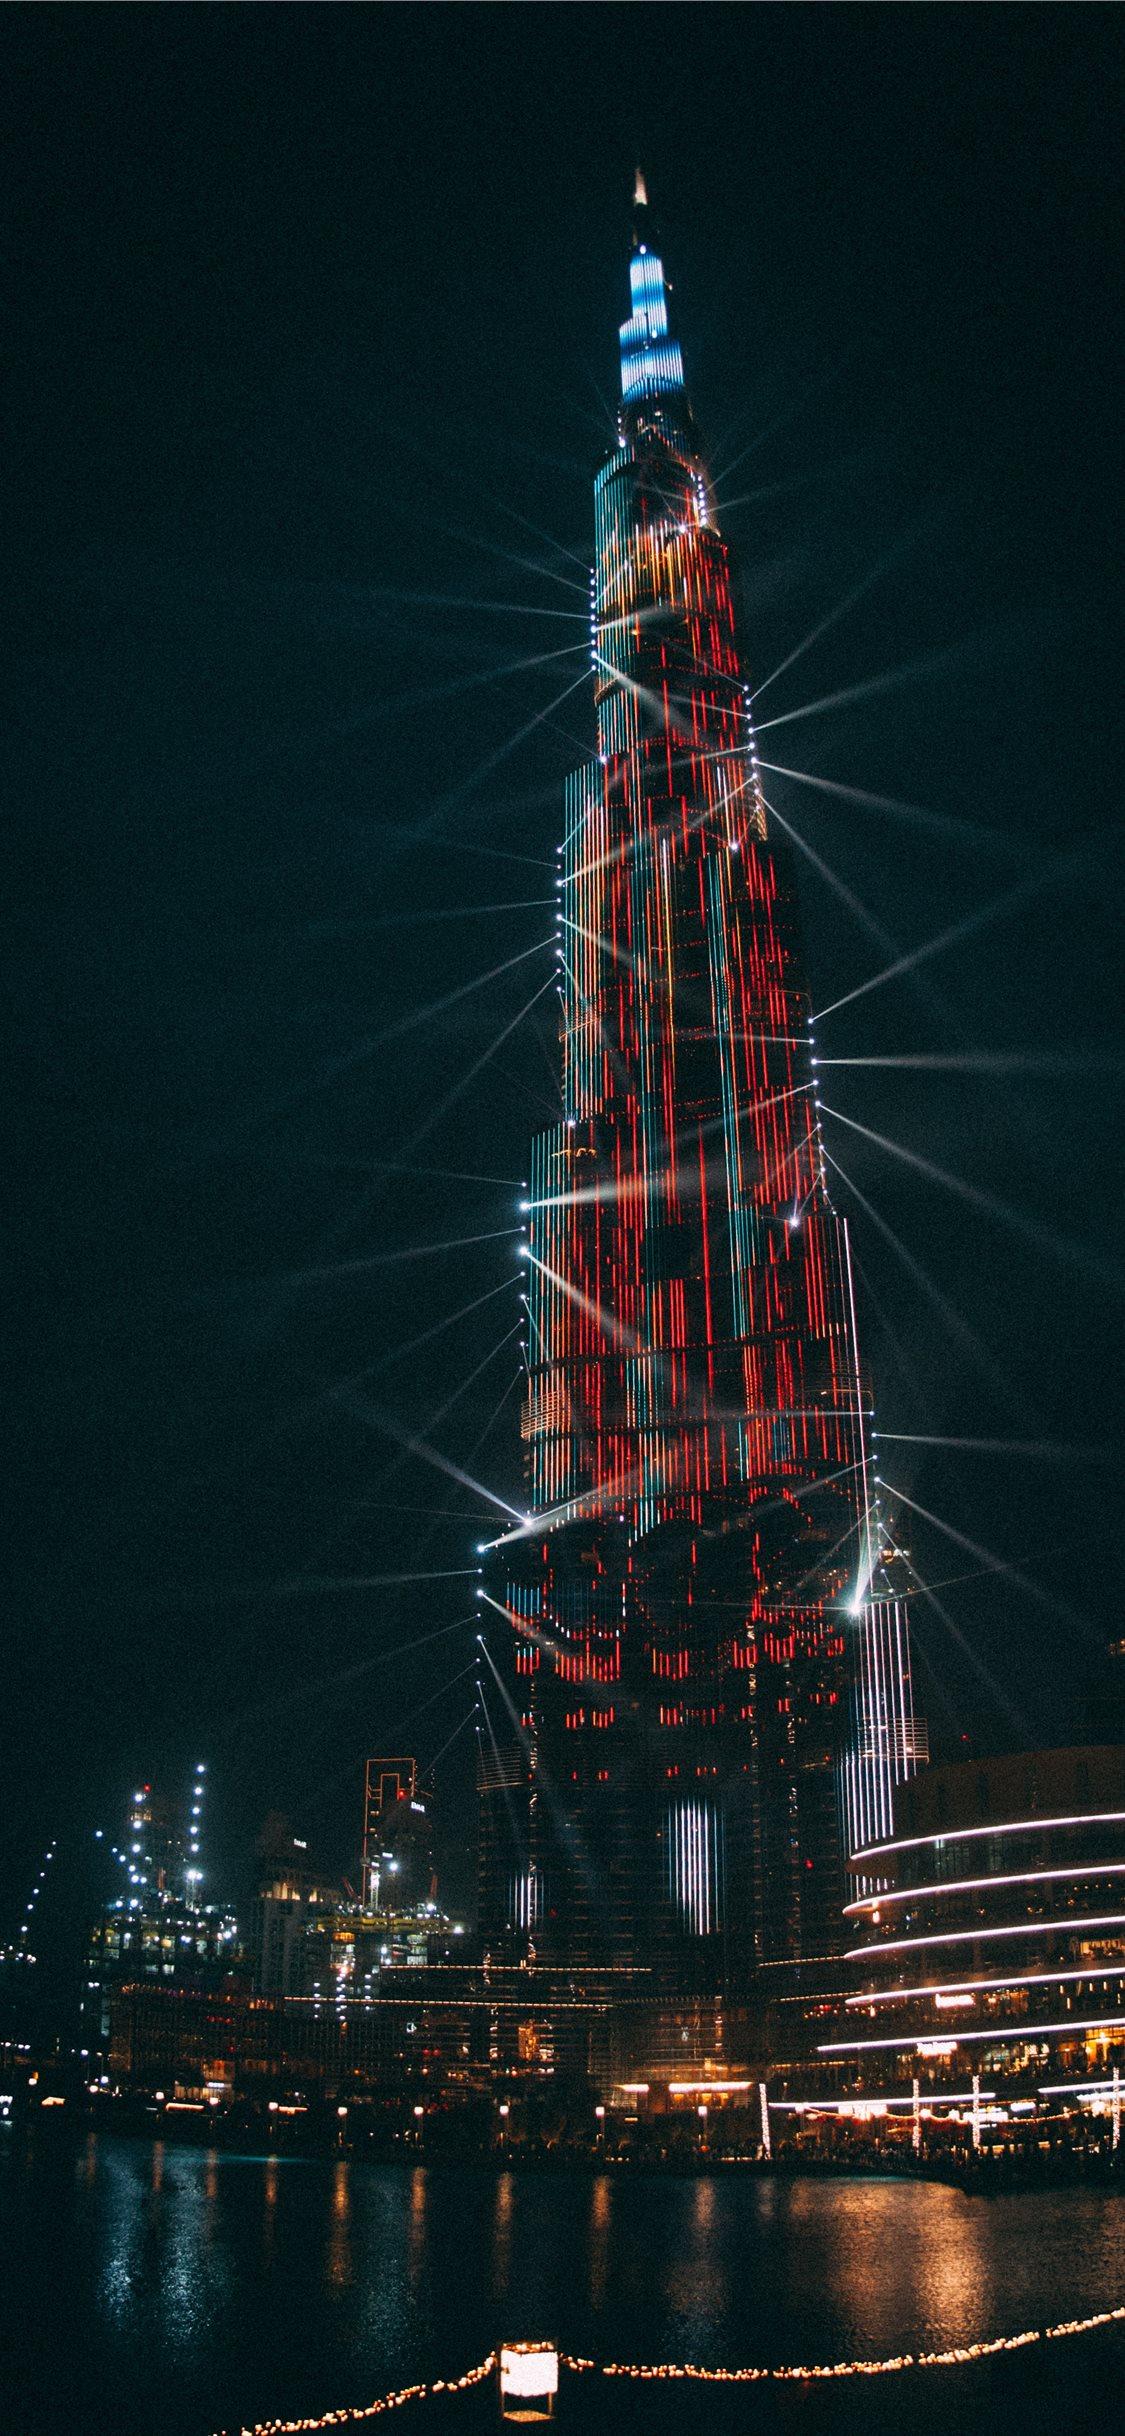 Burj Khalifa Iphone X Wallpapers Free Download